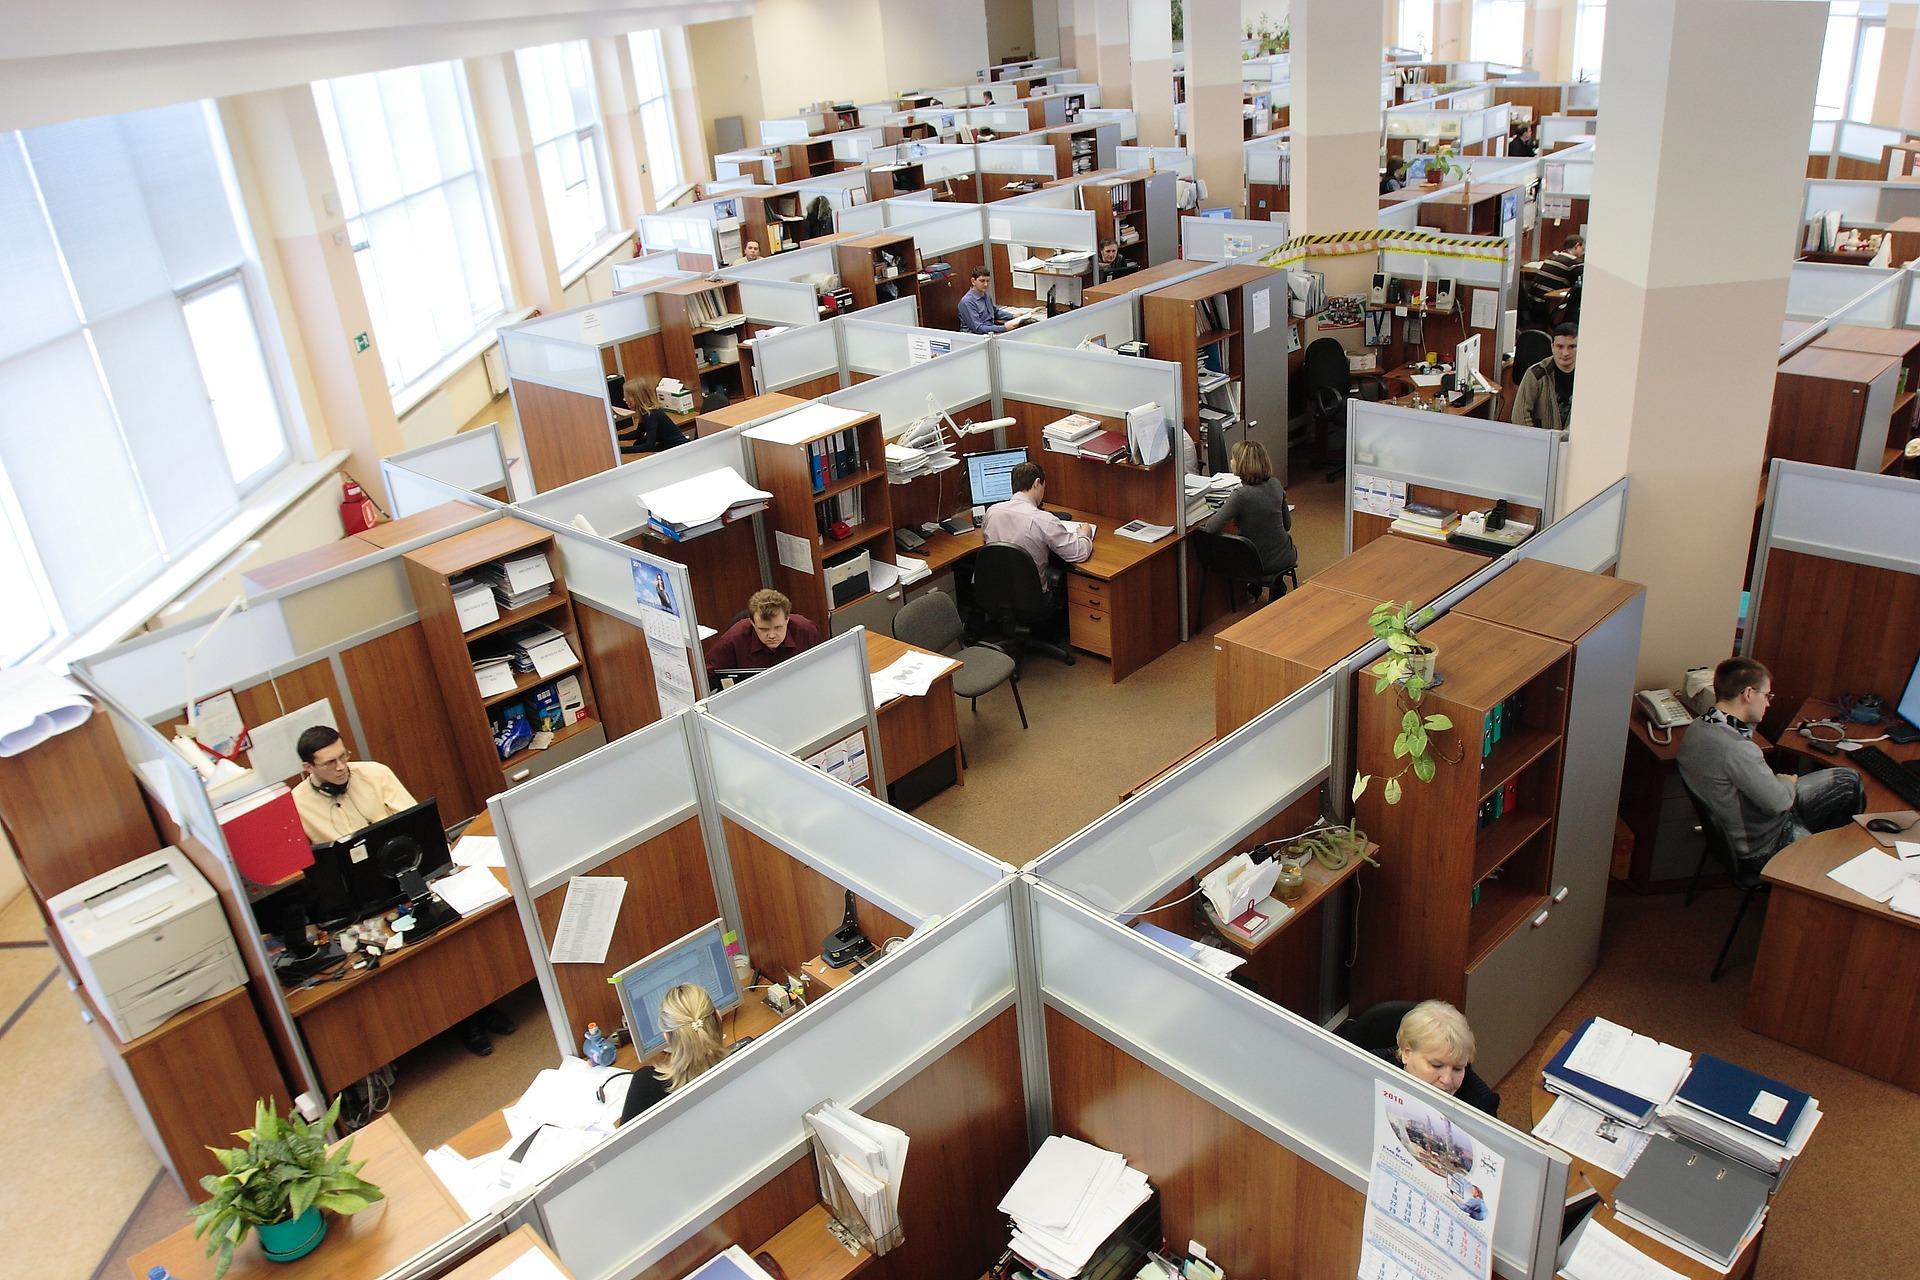 Arbeitnehmerstatus trotz Werkvertrags